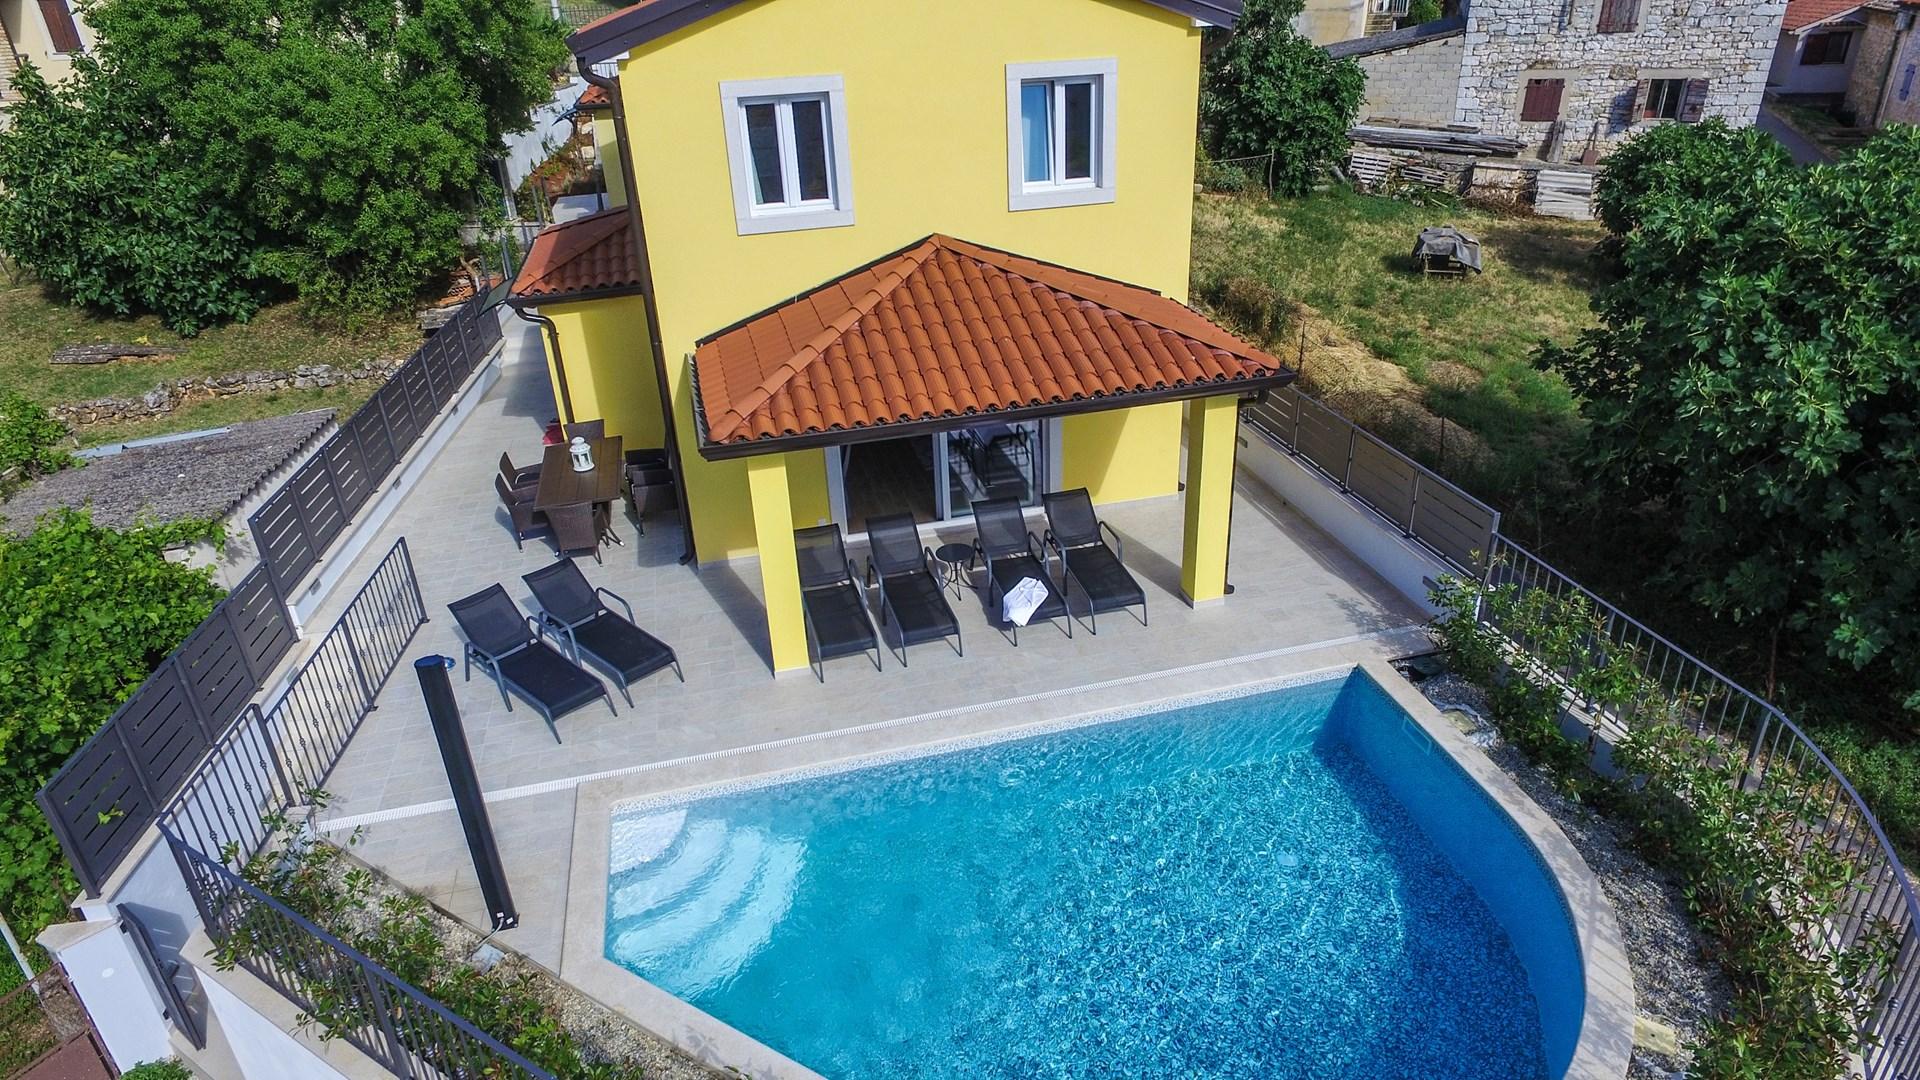 Ferienhaus Villa Cecilia mit privatem Pool in der Nähe von Aquacolors (2240240), Mugeba, , Istrien, Kroatien, Bild 2